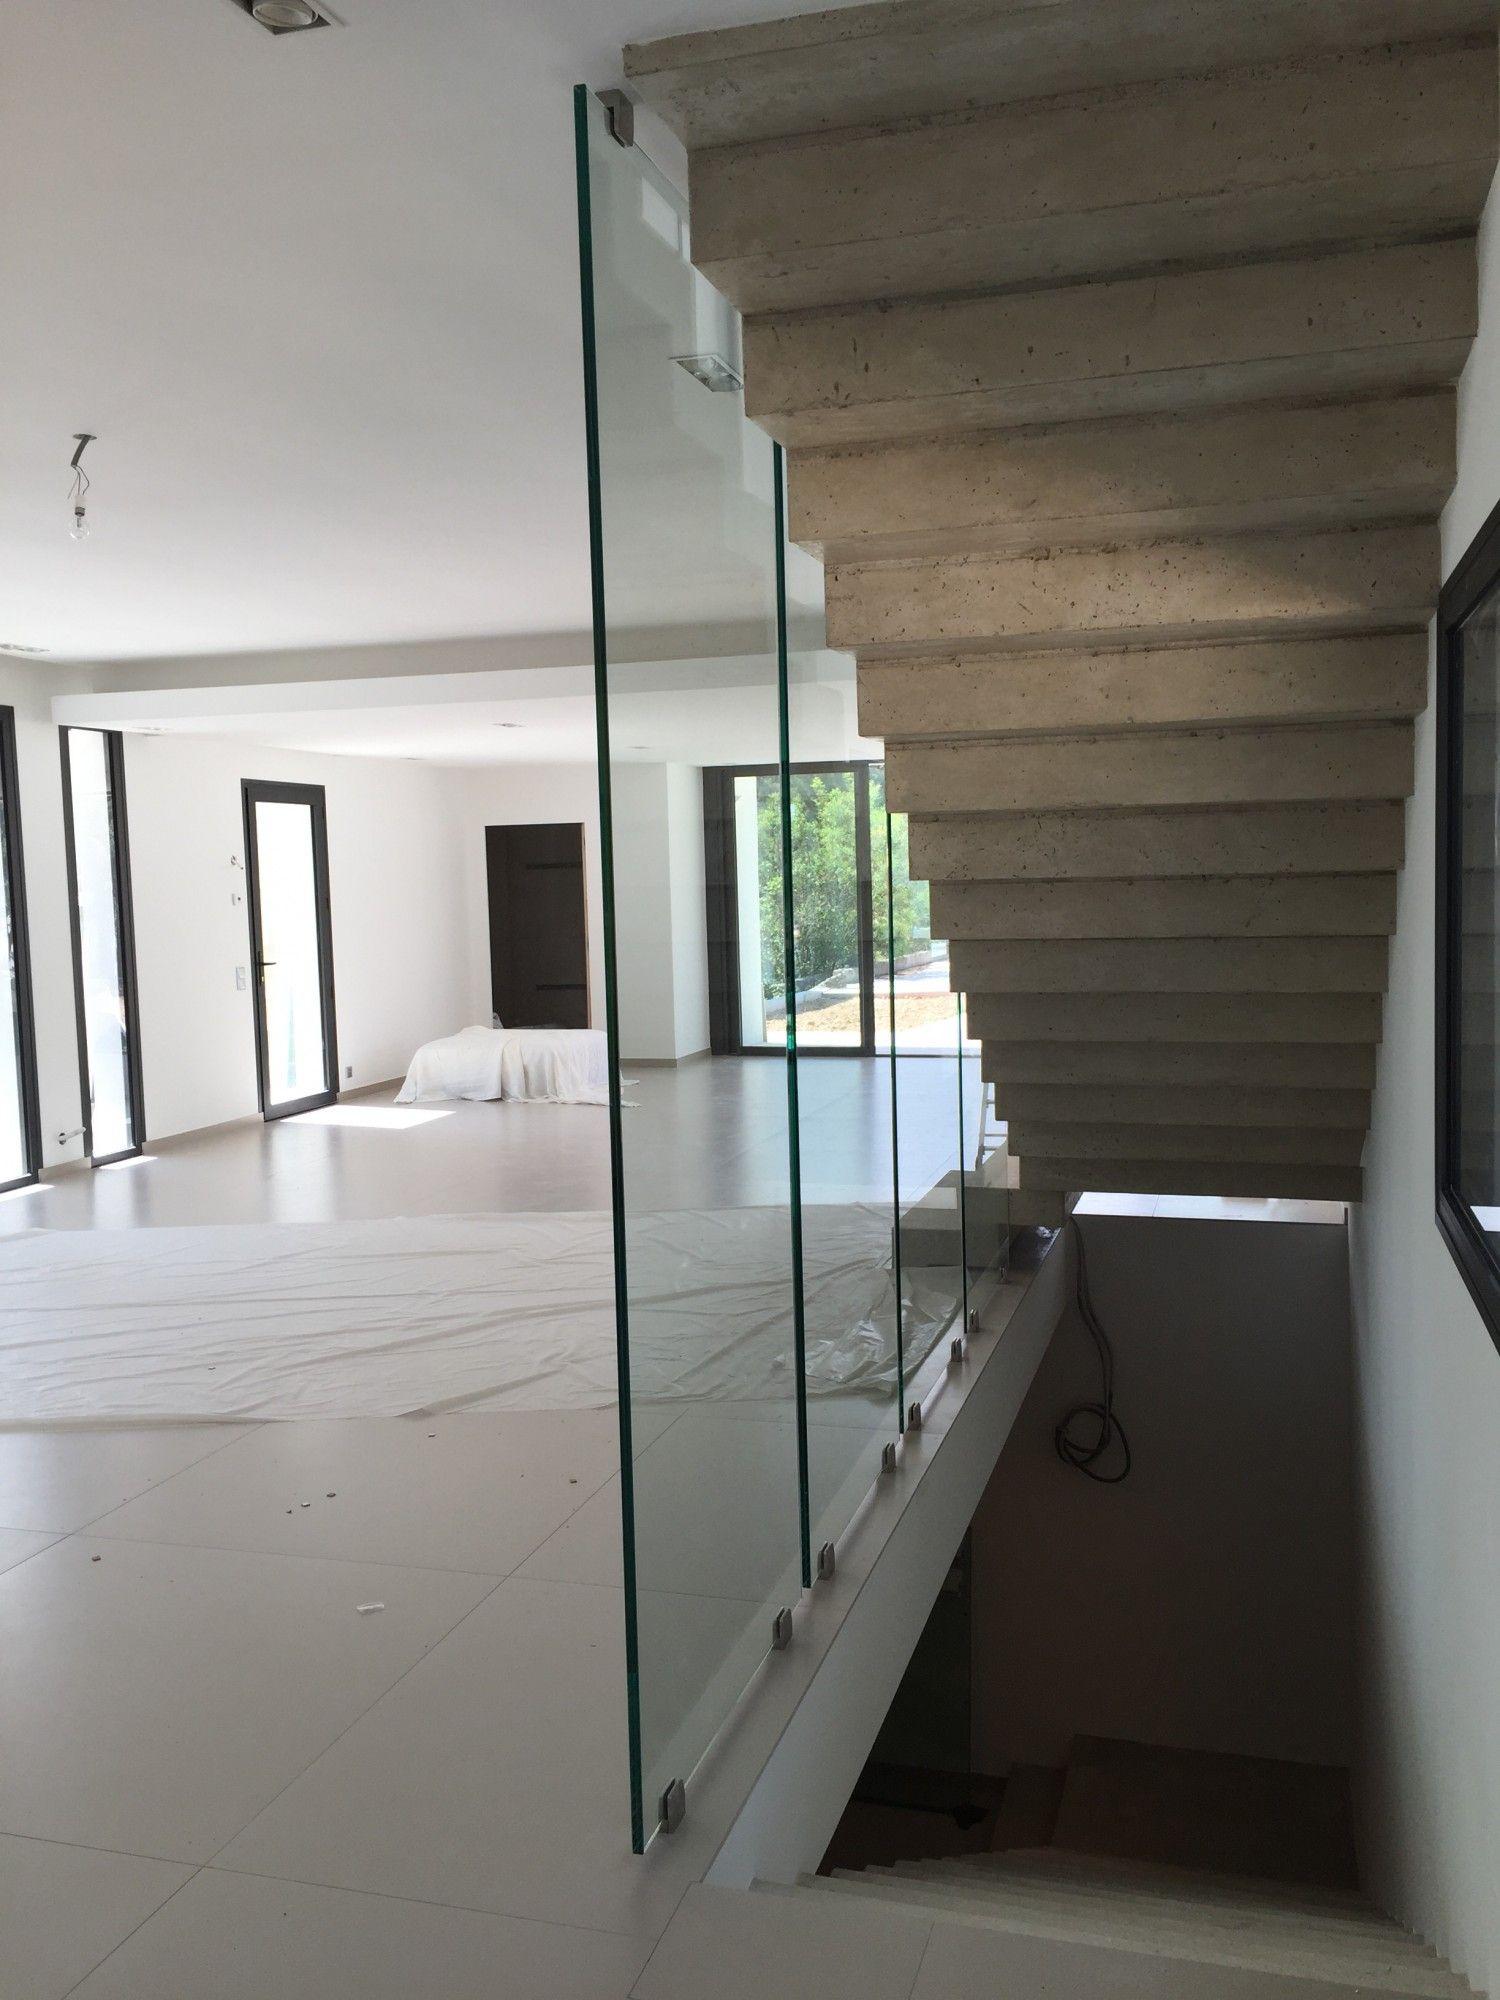 pose de parois de verre devant un escalier marseille alberstore. Black Bedroom Furniture Sets. Home Design Ideas